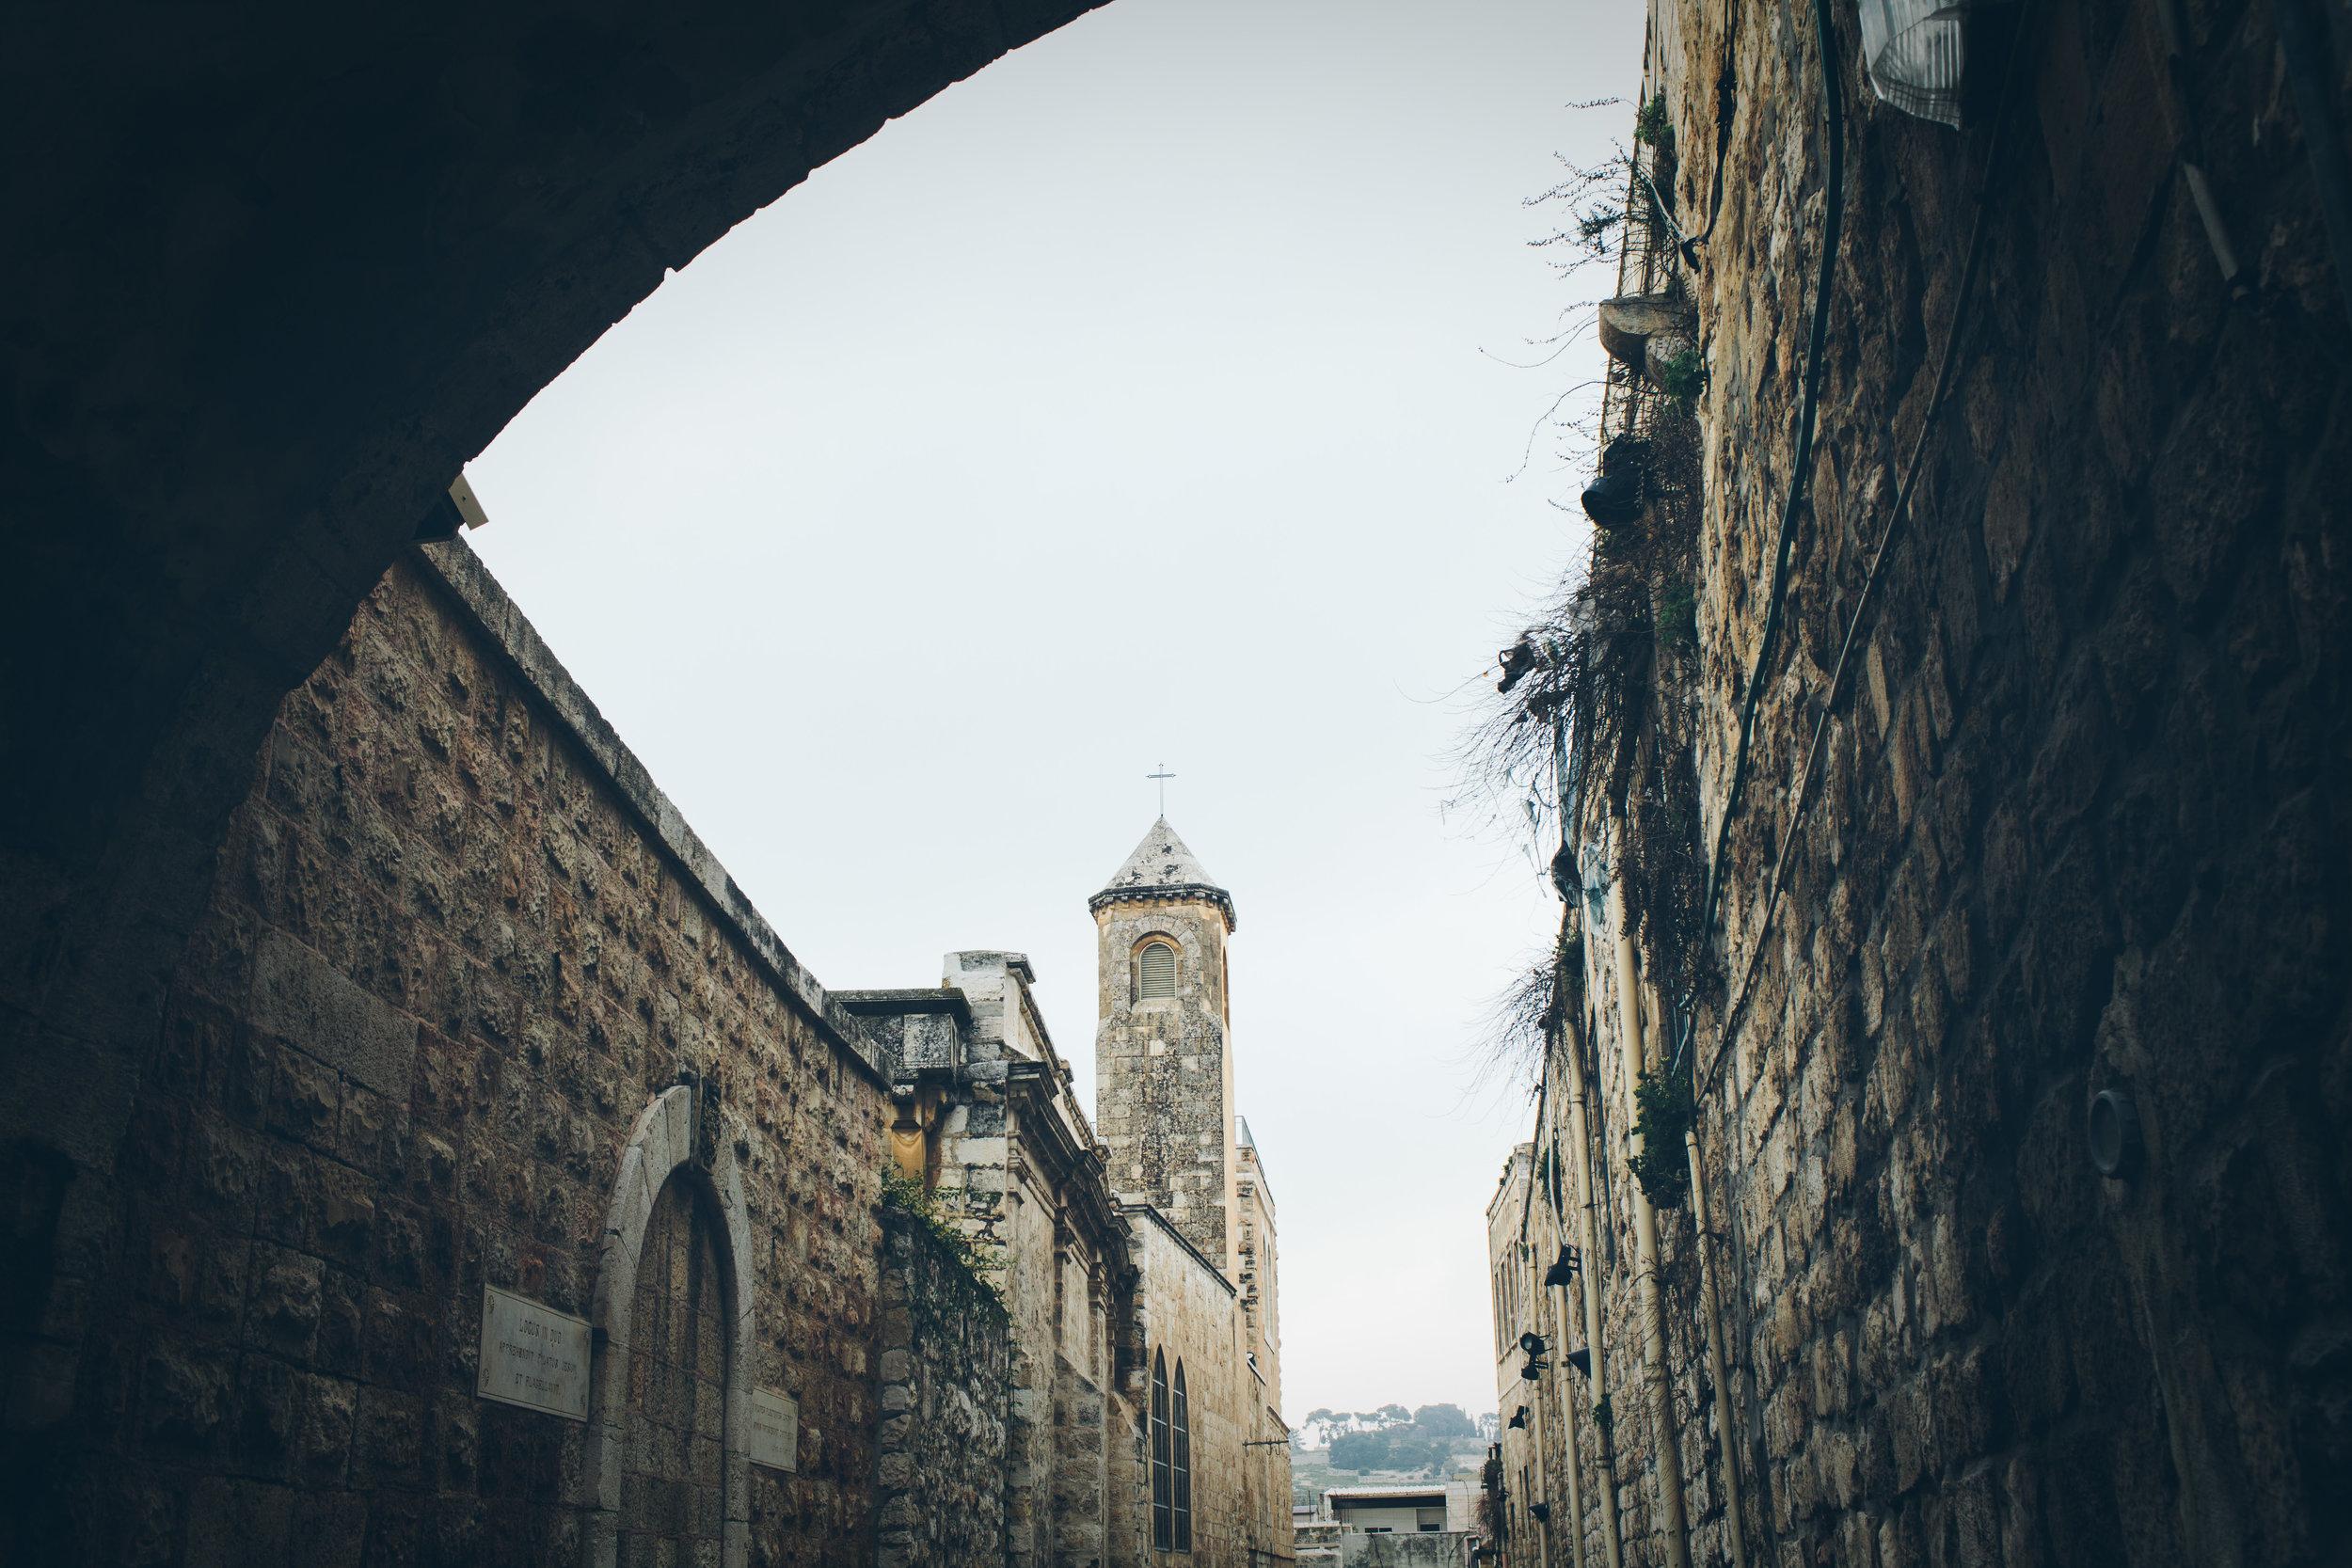 ISRAEL-JERUSALEM-NYC-CYNTHIACHUNG-1012.jpg